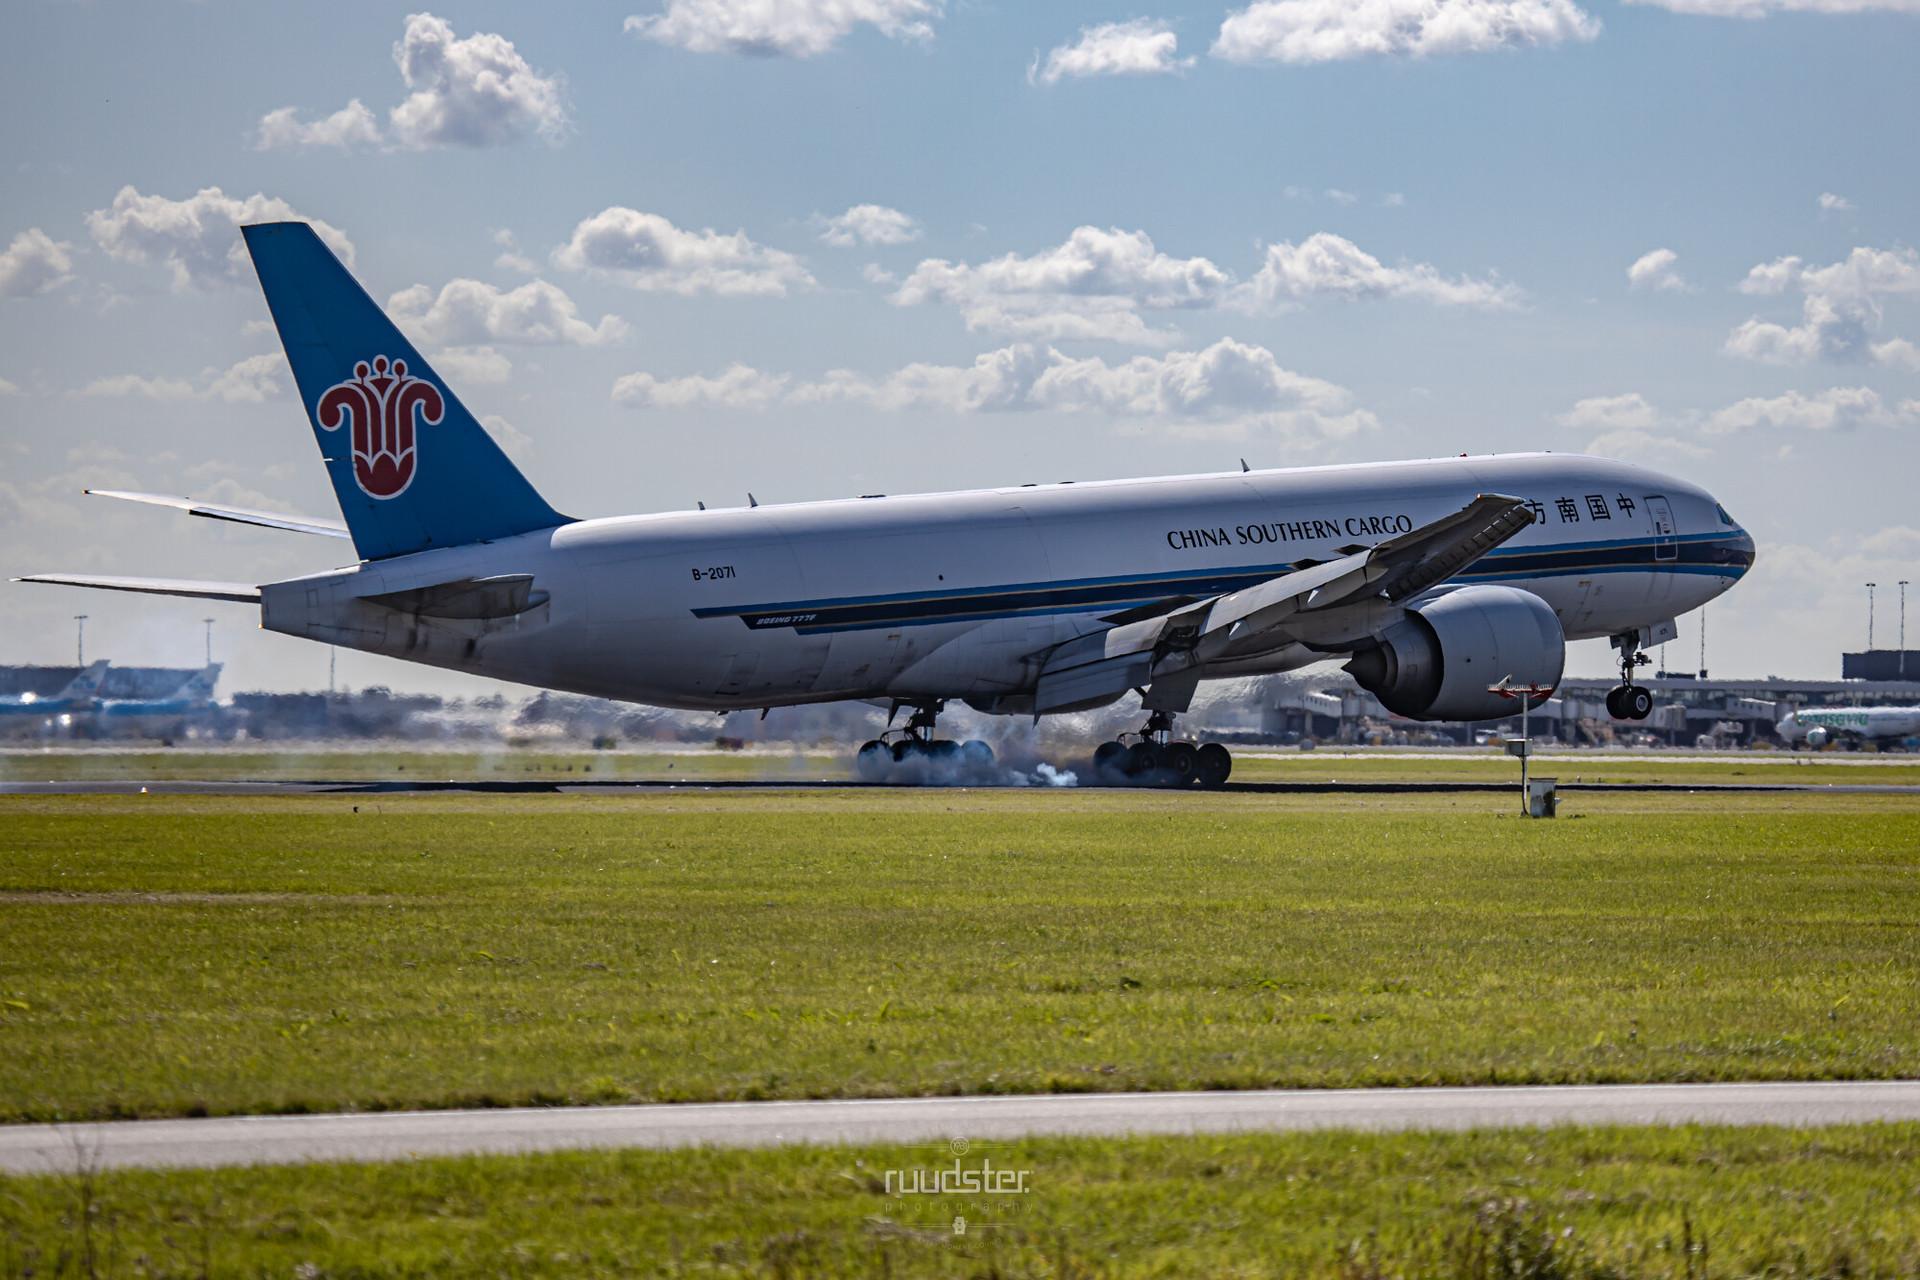 B-2071 | Build: 2010 - Boeing 777-F1B